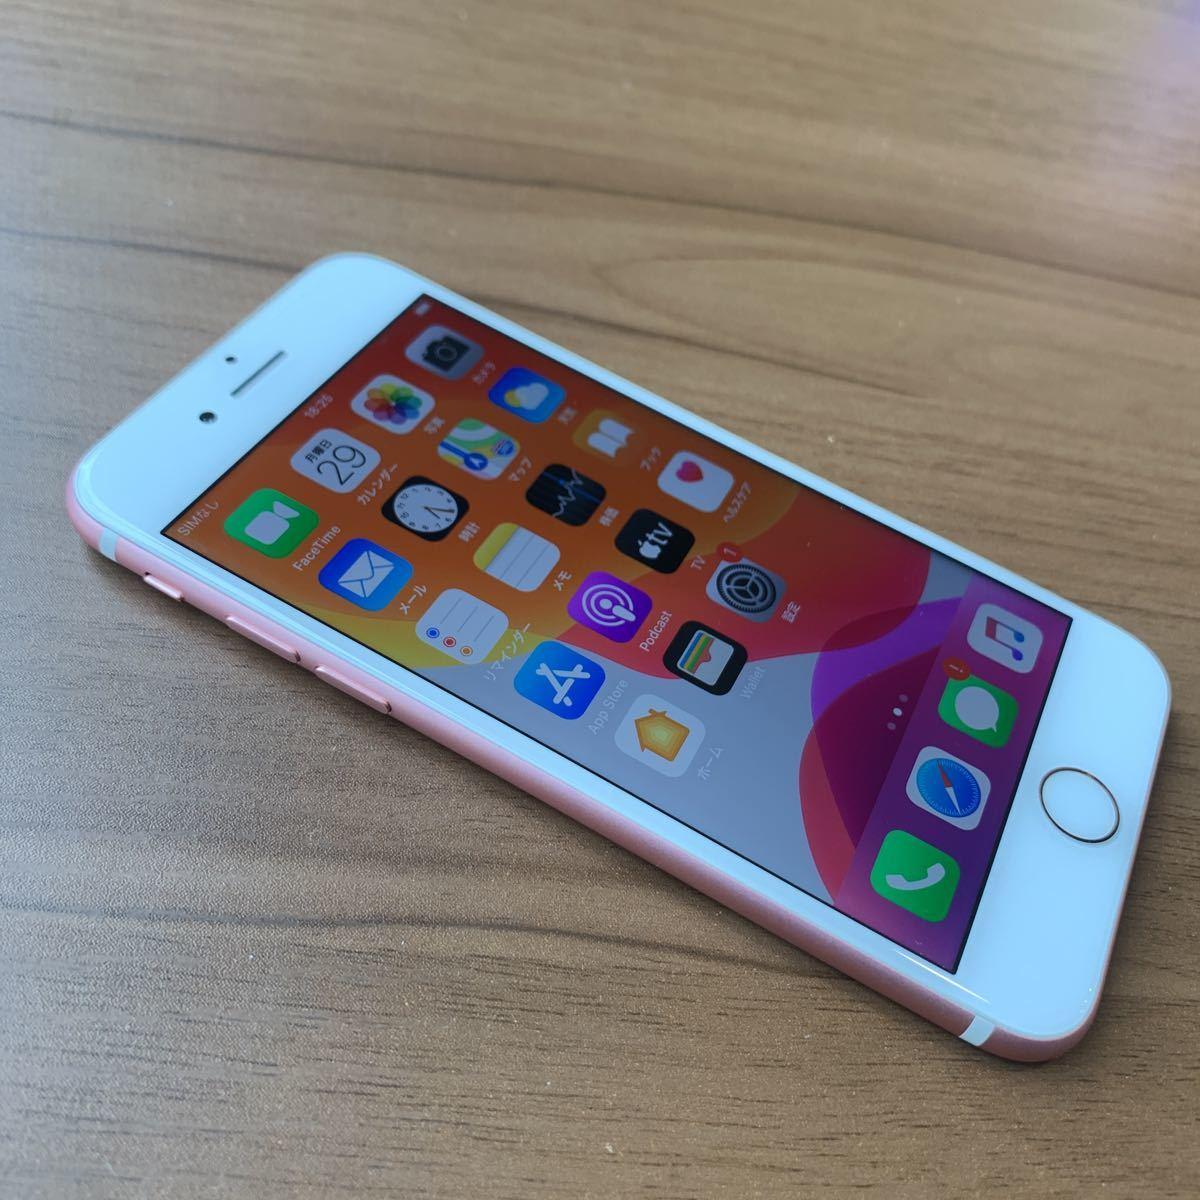 iPhone7 32G Rose GOLD SIMフリー 中古 比較的美品 6596_画像3